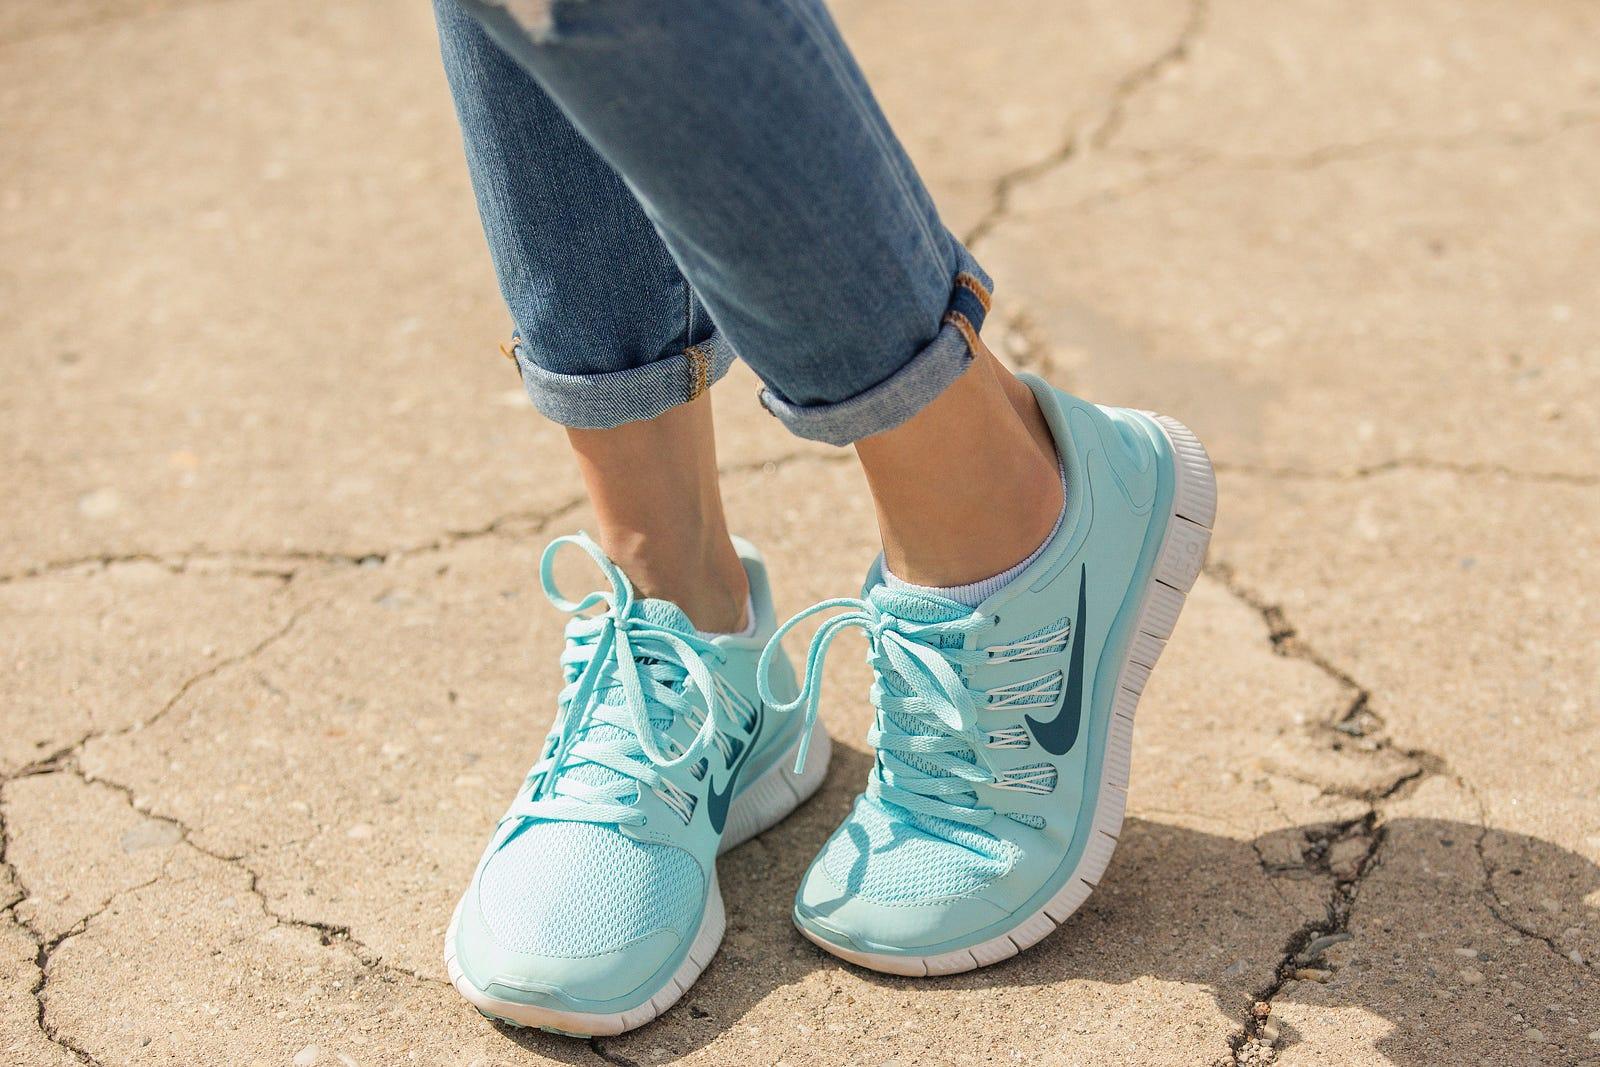 Celine White Tennis Shoes